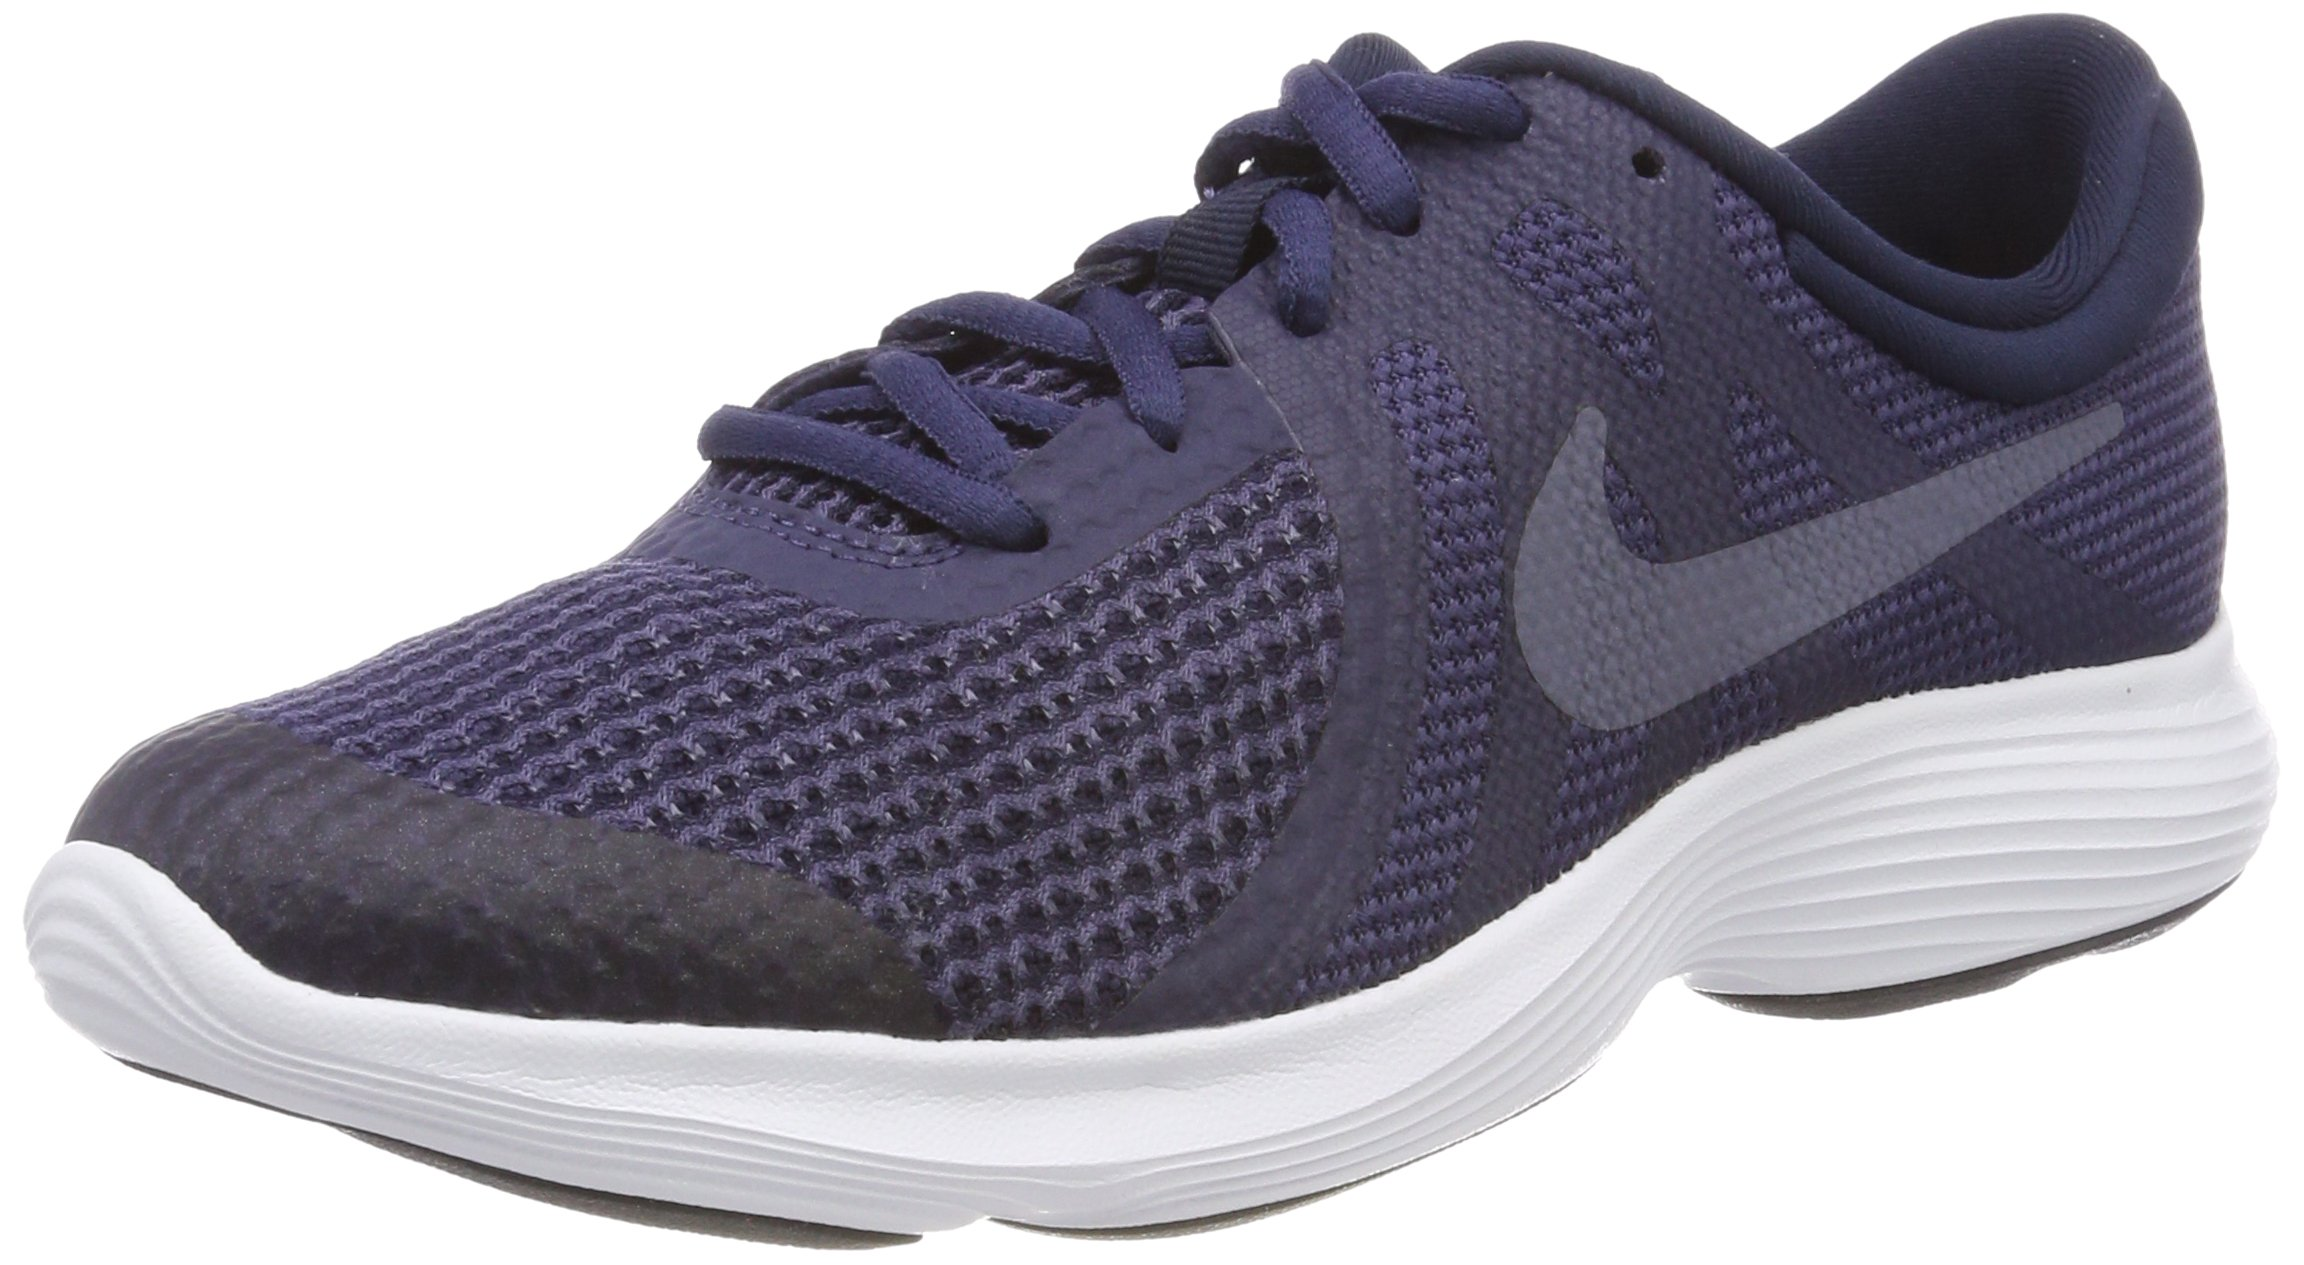 Nike Boys' Revolution 4 (GS) Running Shoe, Black/White-Anthracite, 4.5Y Youth US Big Kid